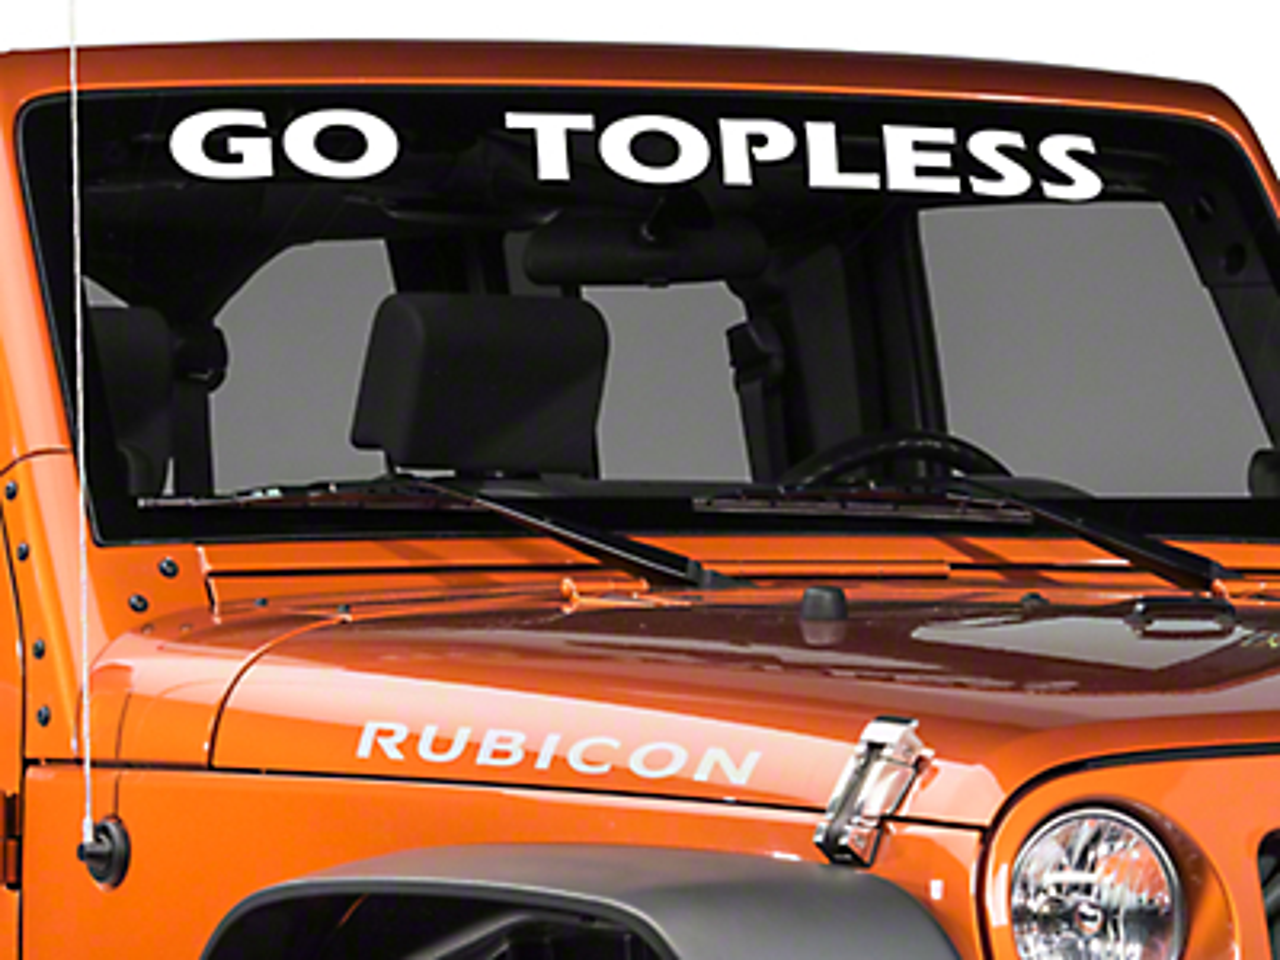 Go Topless Windshield Banner - White (87-18 Wrangler YJ, TJ, JK & JL)